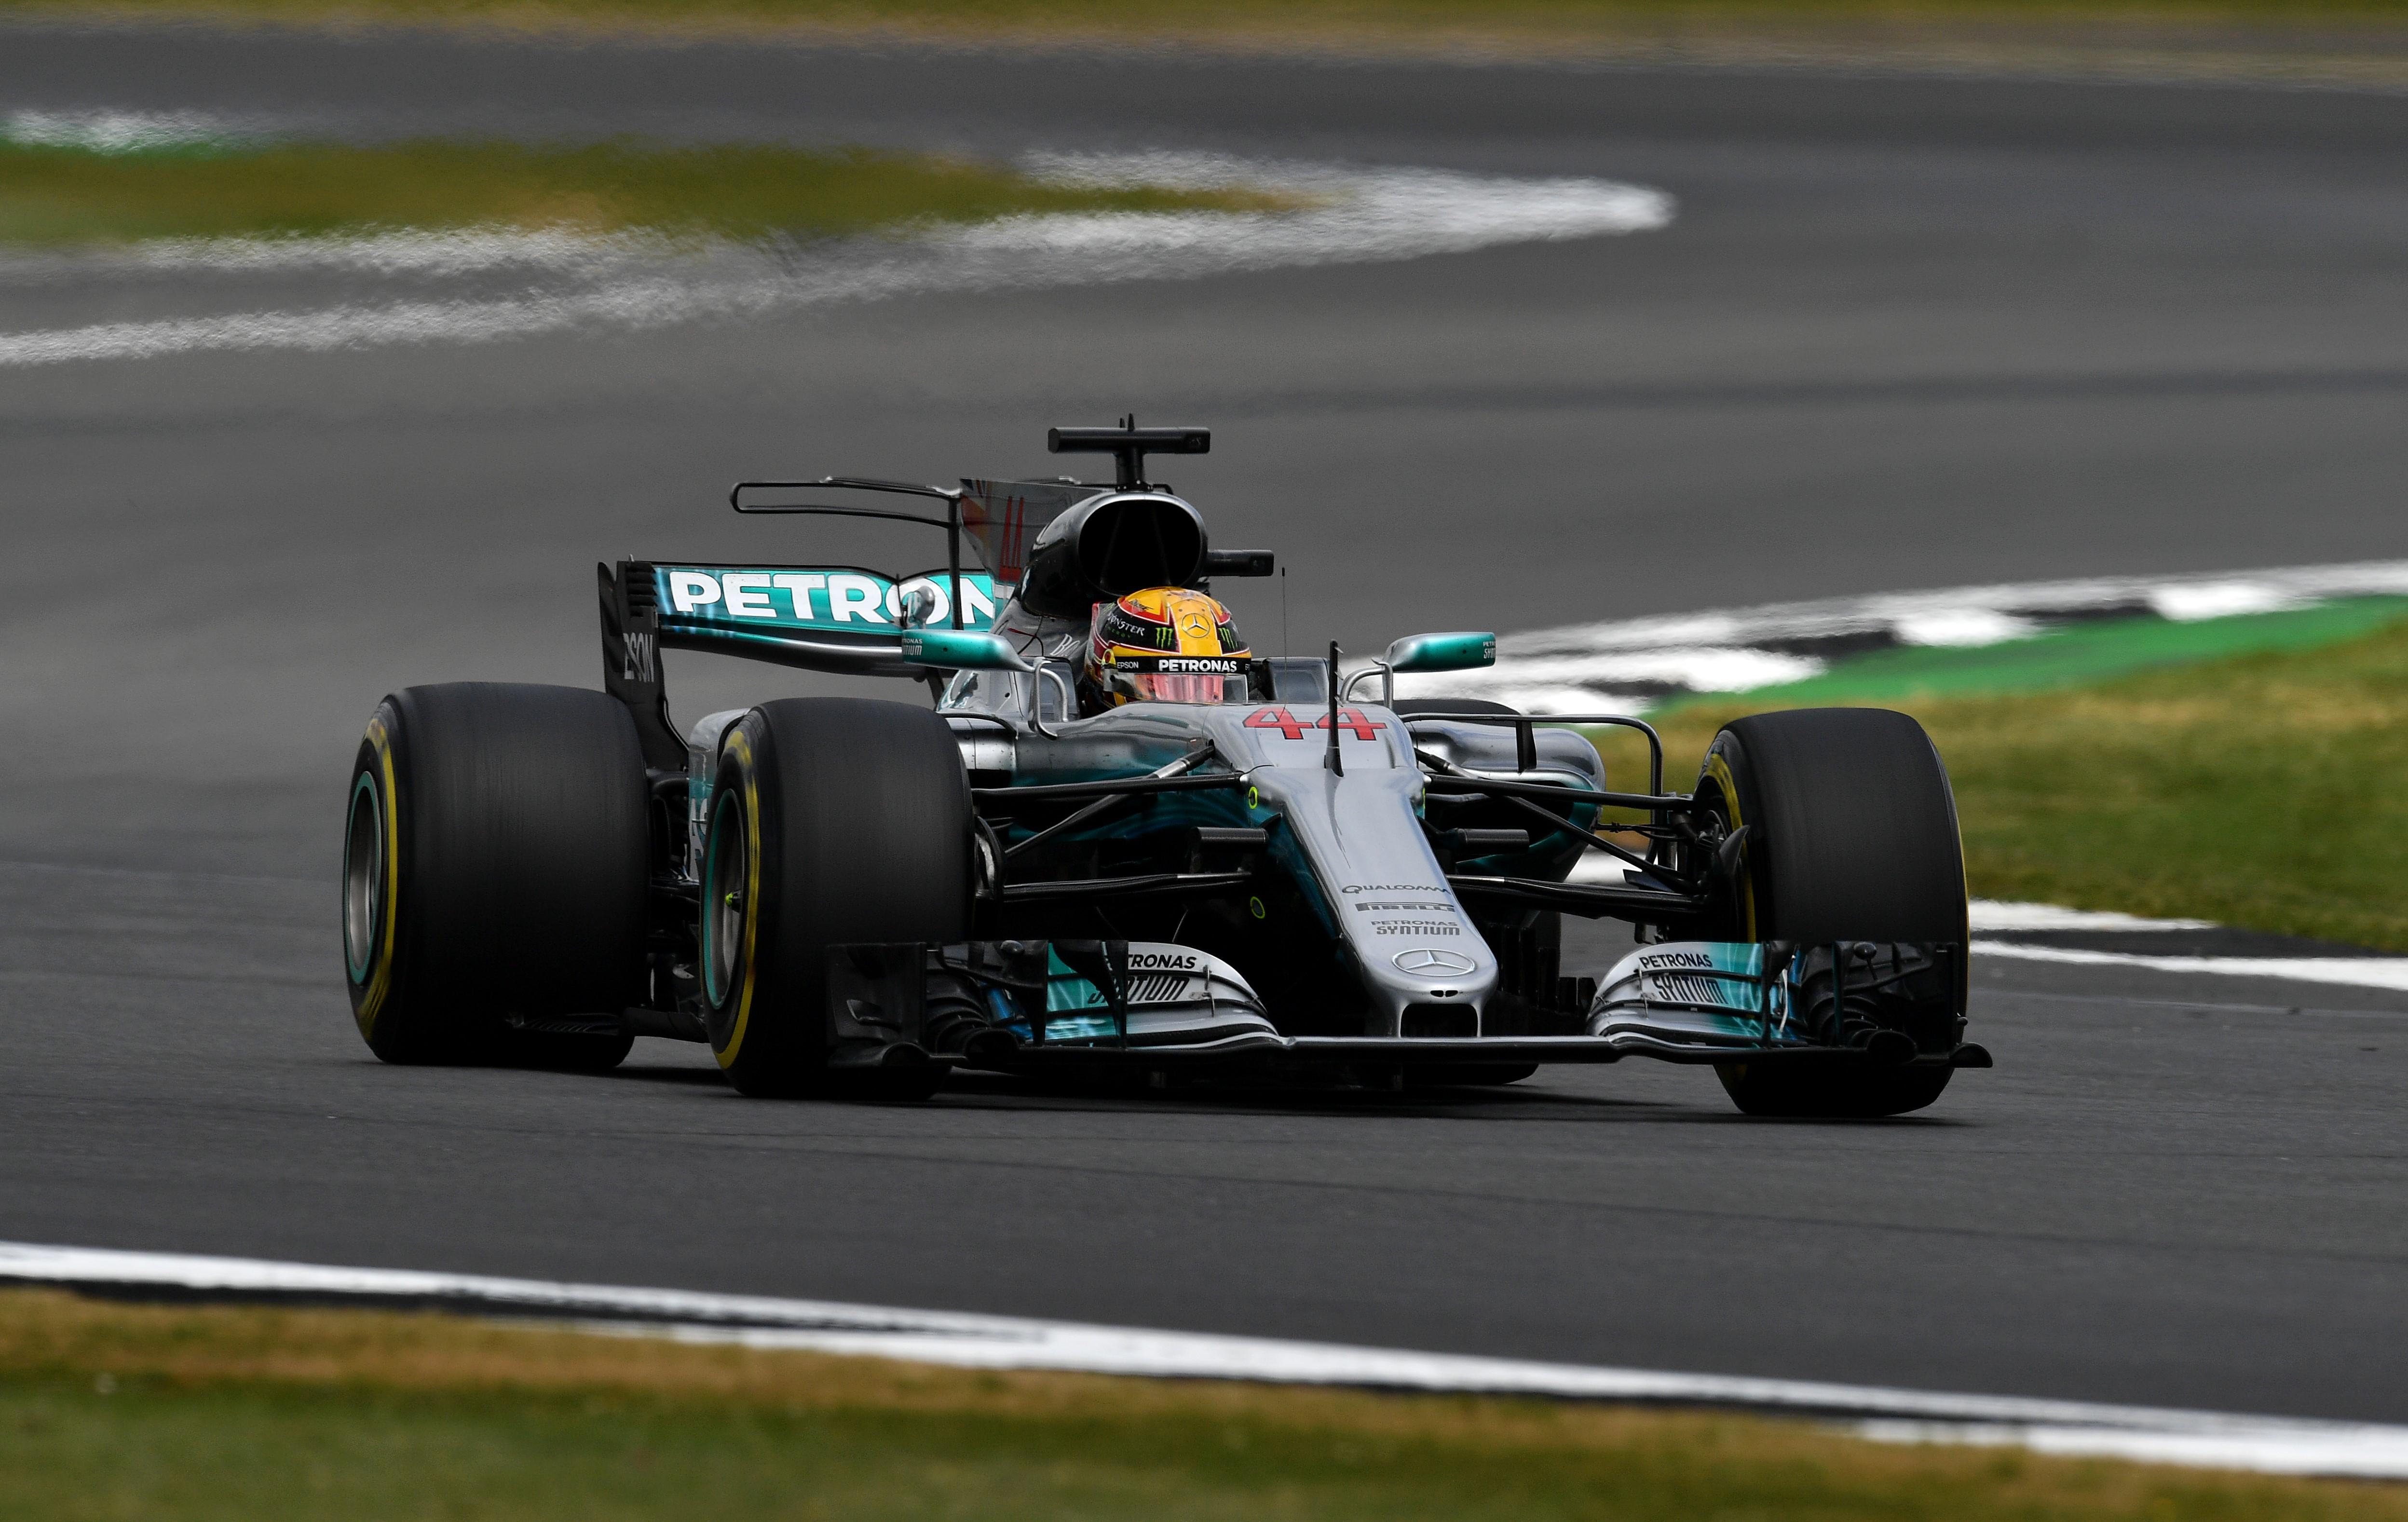 Lewis Hamilton (Mercedes) au Grand Prix de Grande-Bretagne 2017